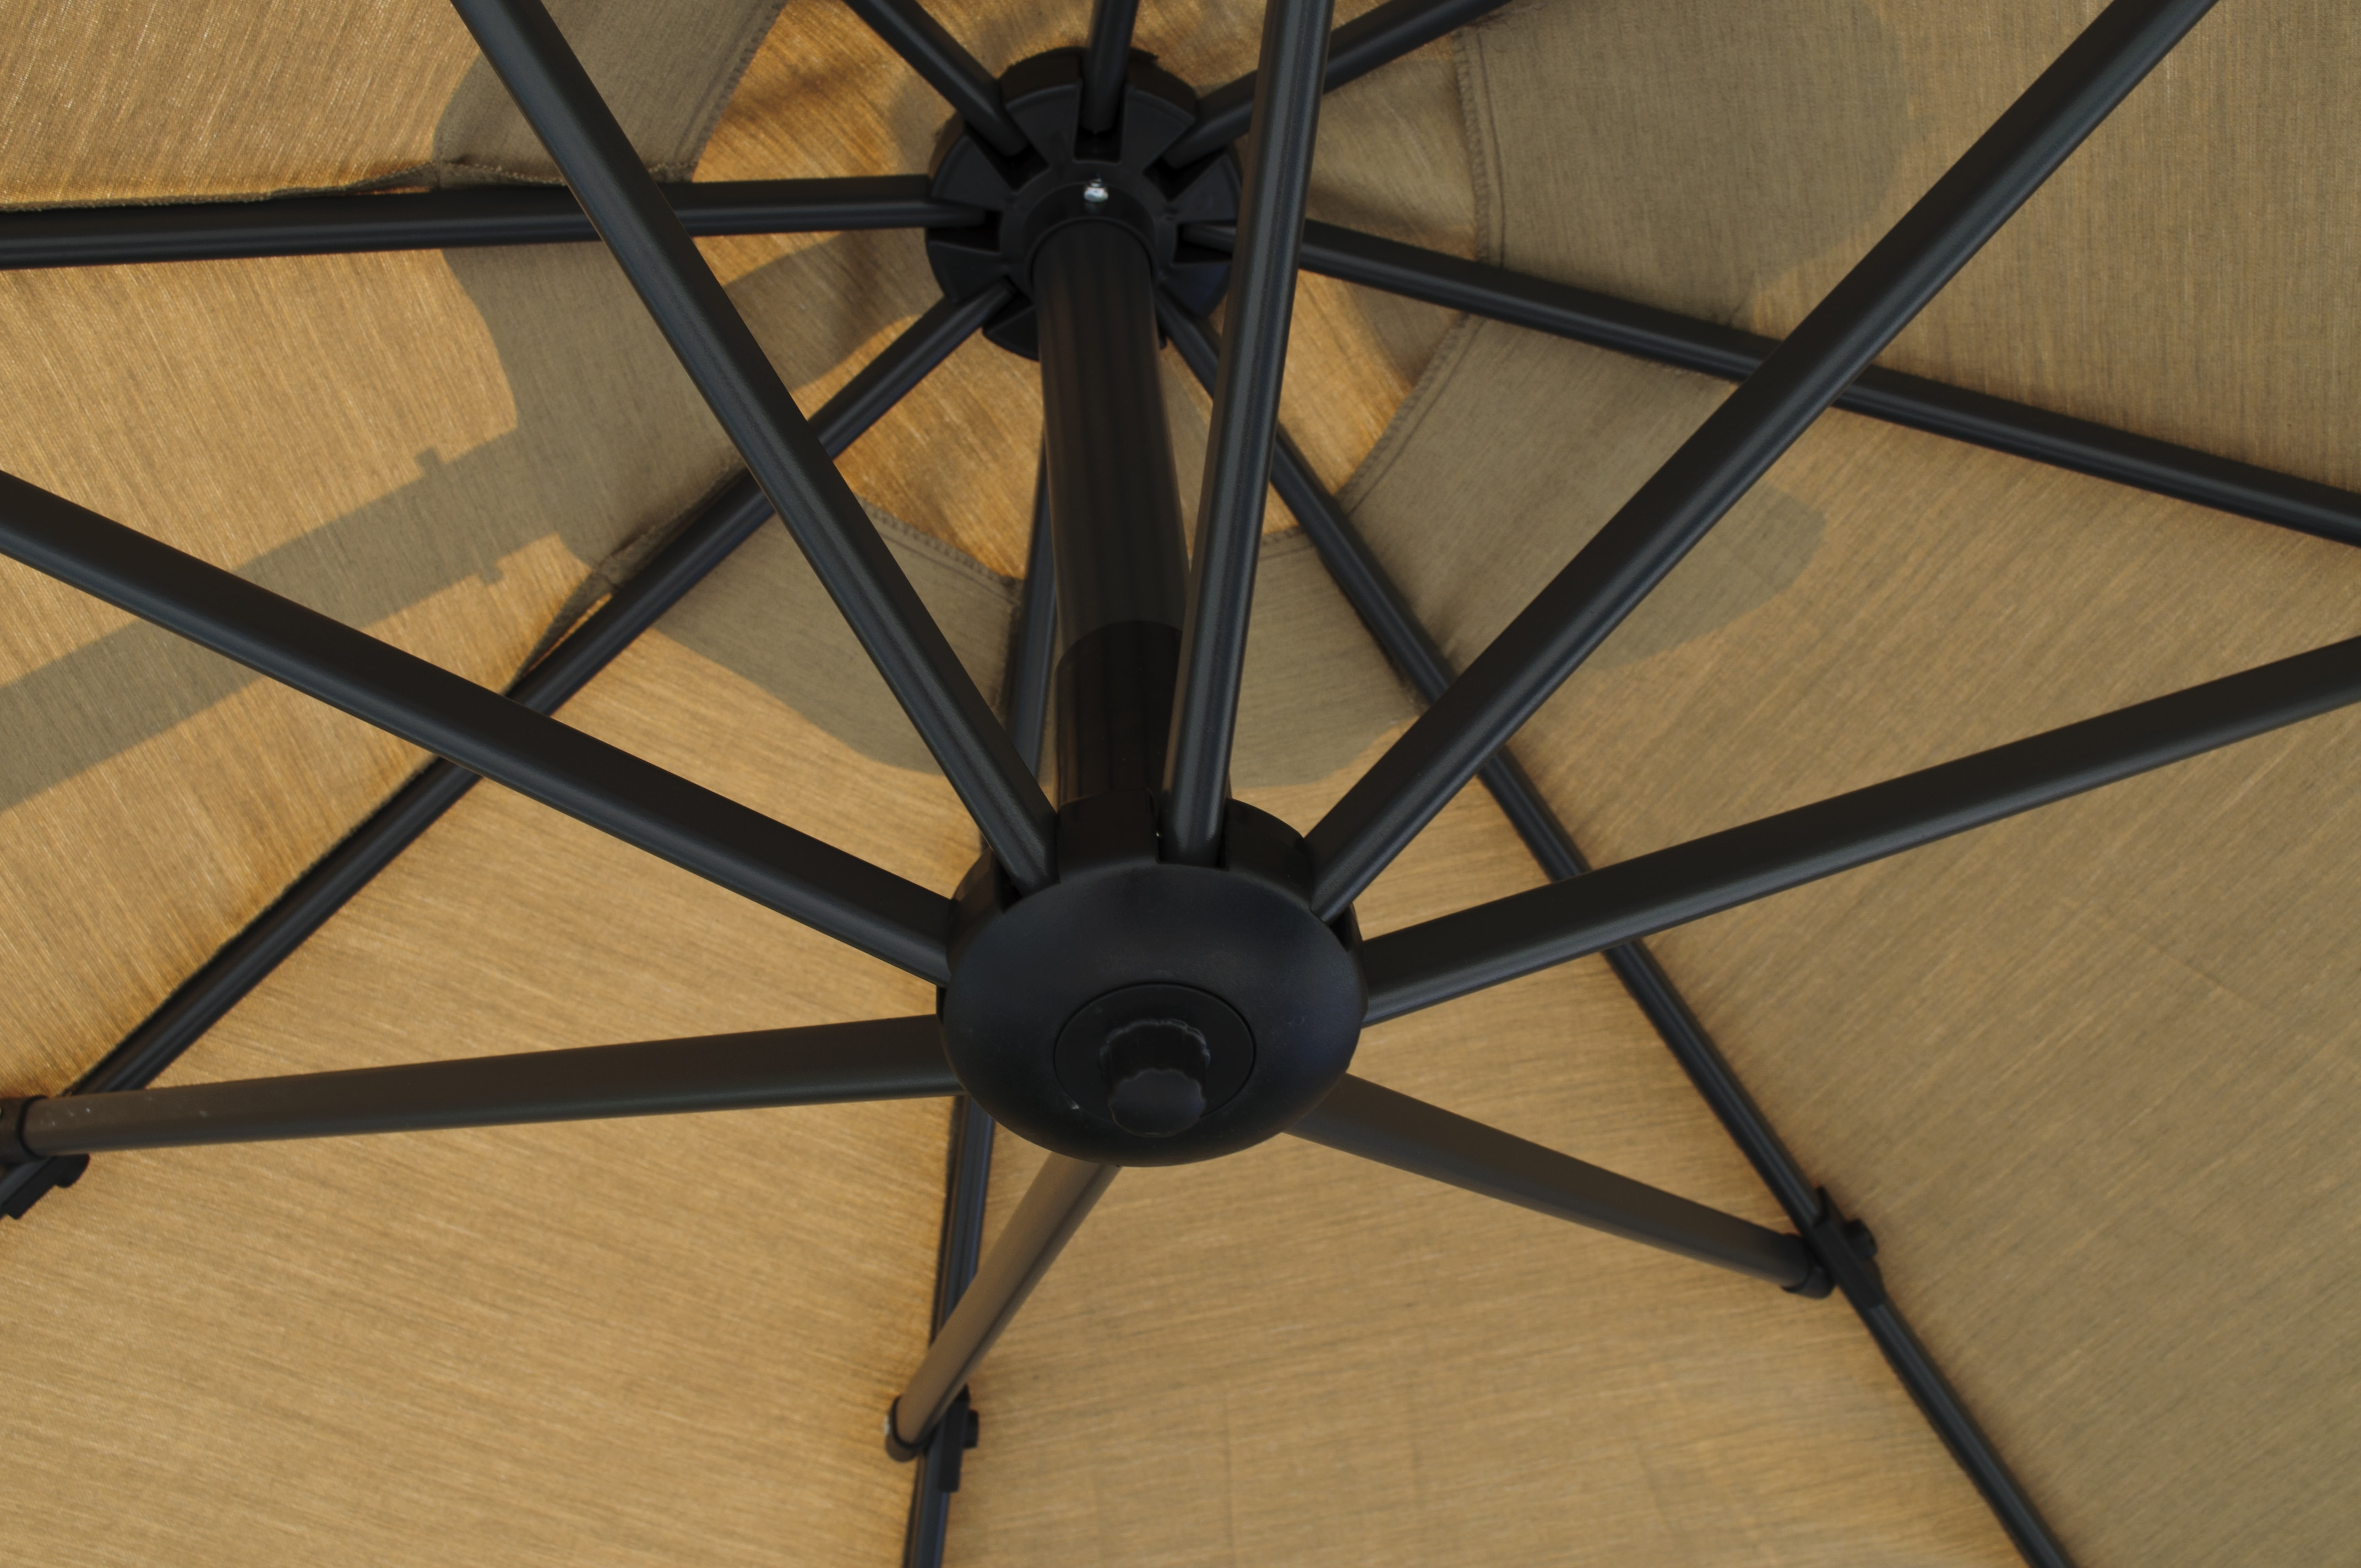 Kontiki Shade & Cooling fset Patio Umbrellas 10 ft Signature